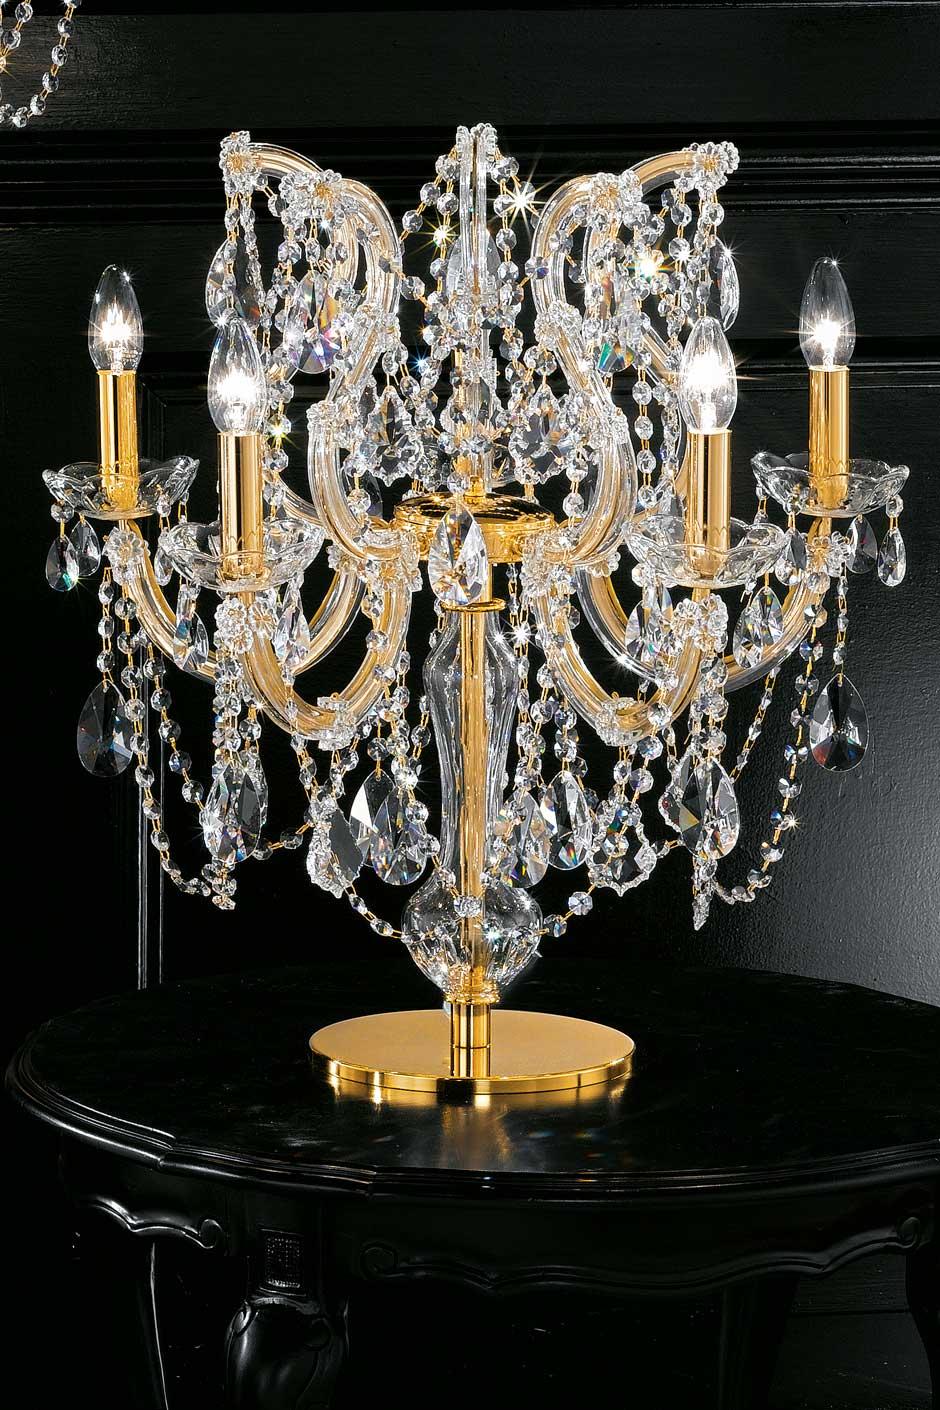 lampe poser chandelier cristal et m tal dor 5 lumi res masiero sp cialiste du lustre en. Black Bedroom Furniture Sets. Home Design Ideas